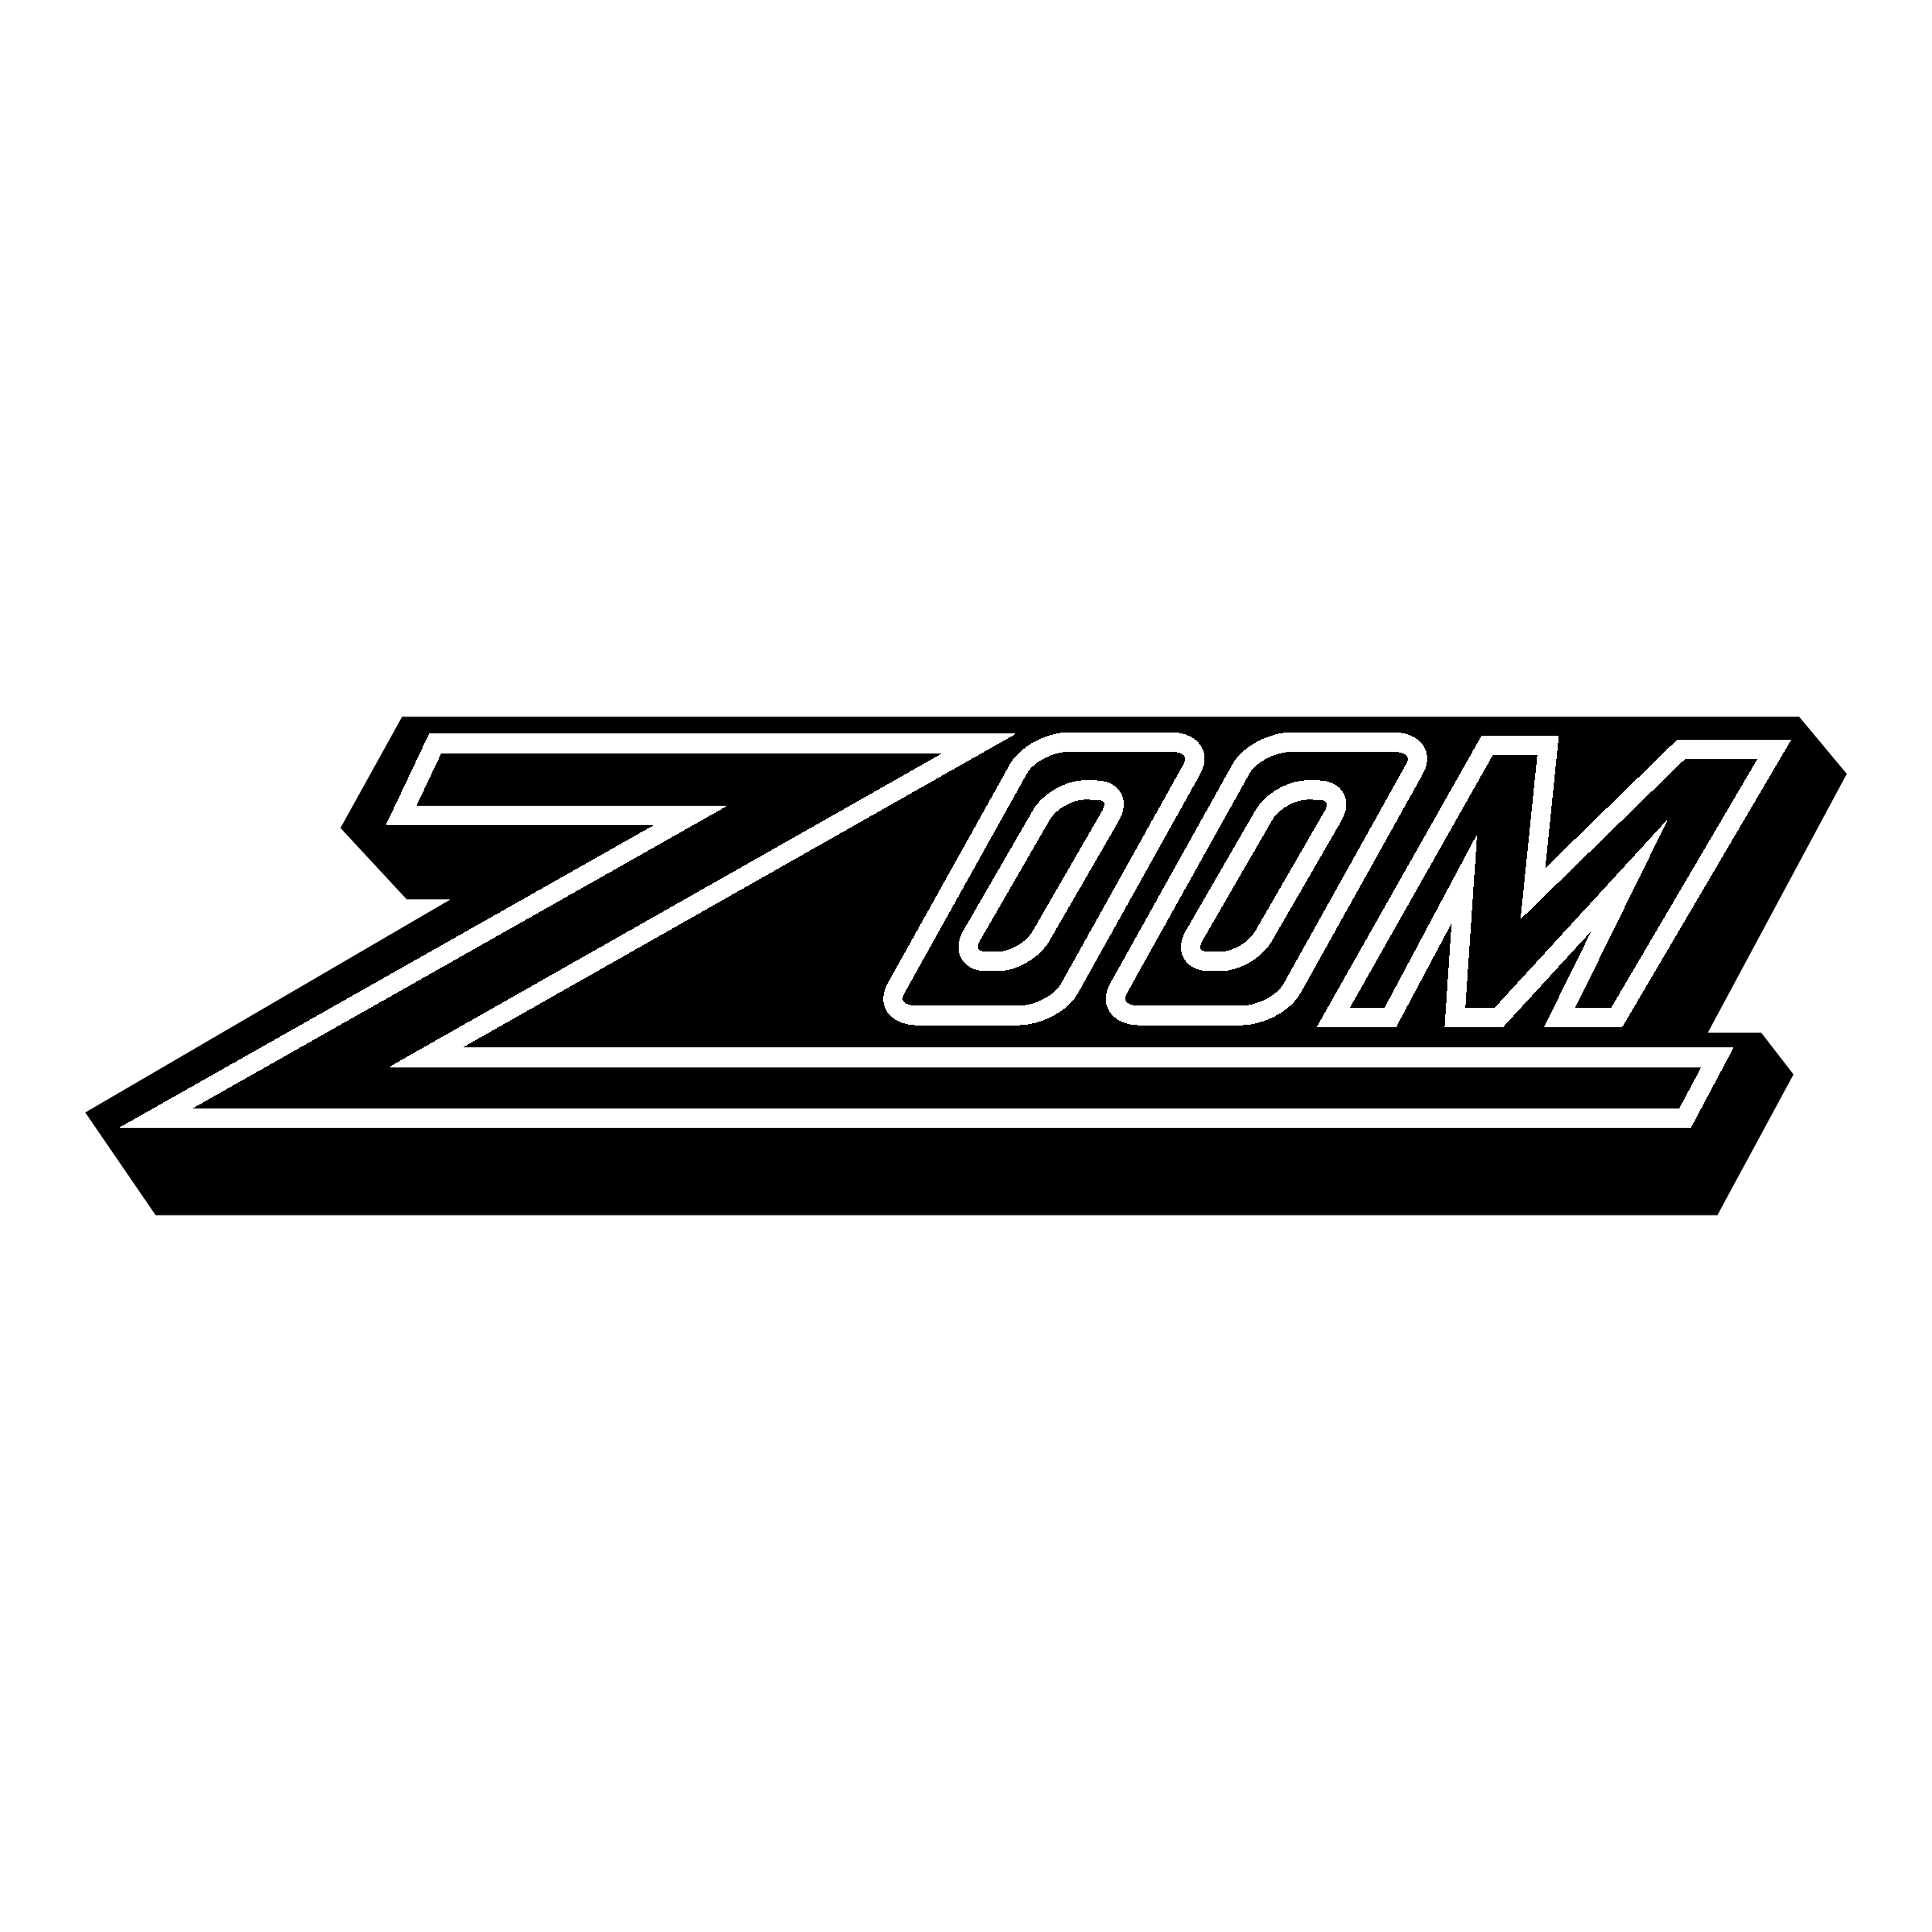 Zoom Logo Png Transparent Svg Vector Freebie Supply